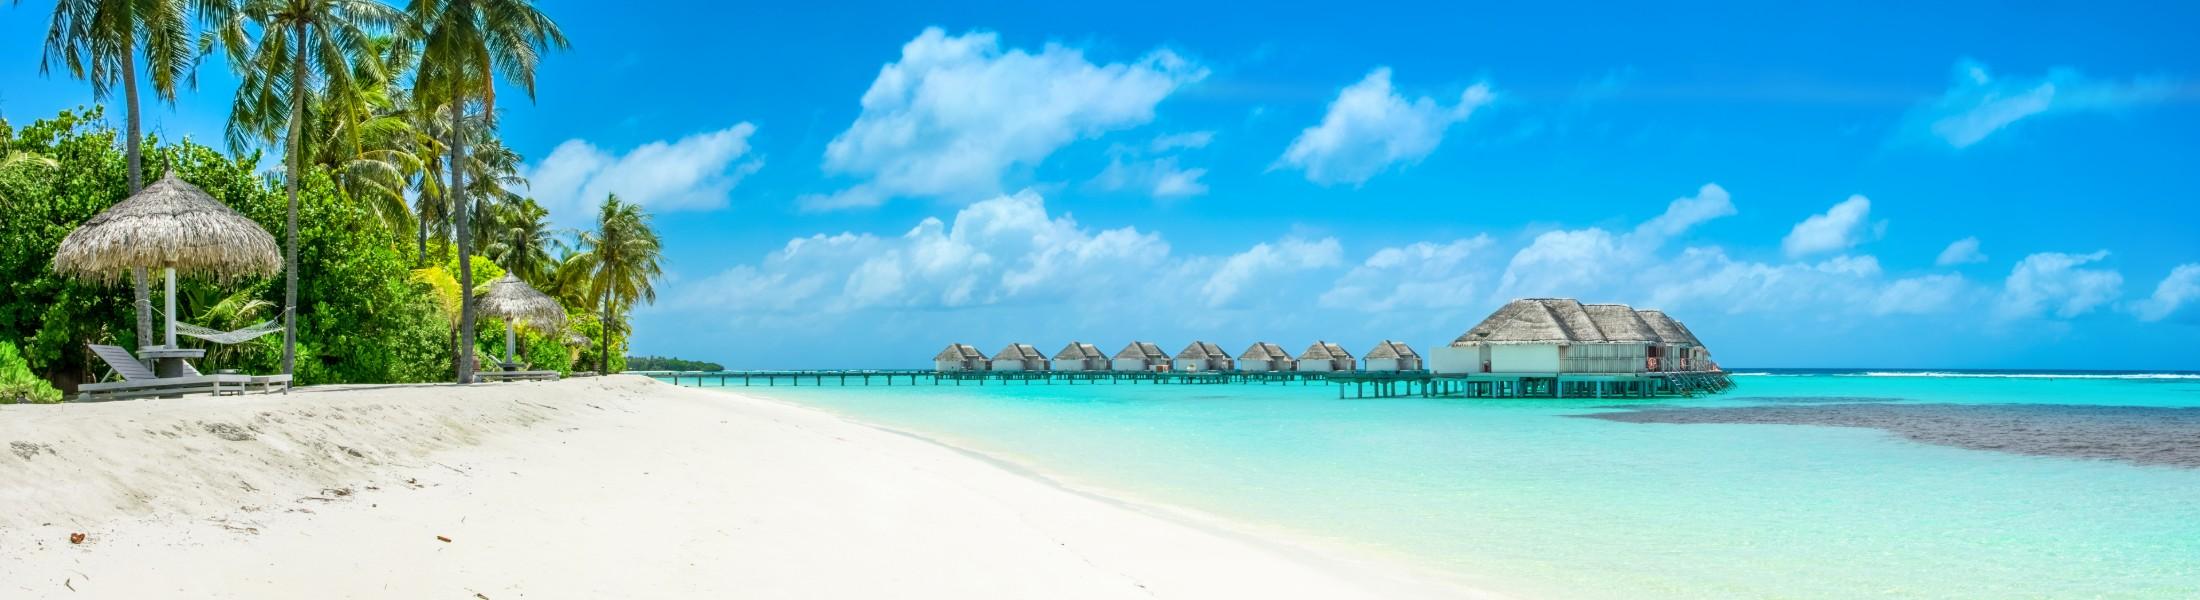 Overwater villas in the Maldives